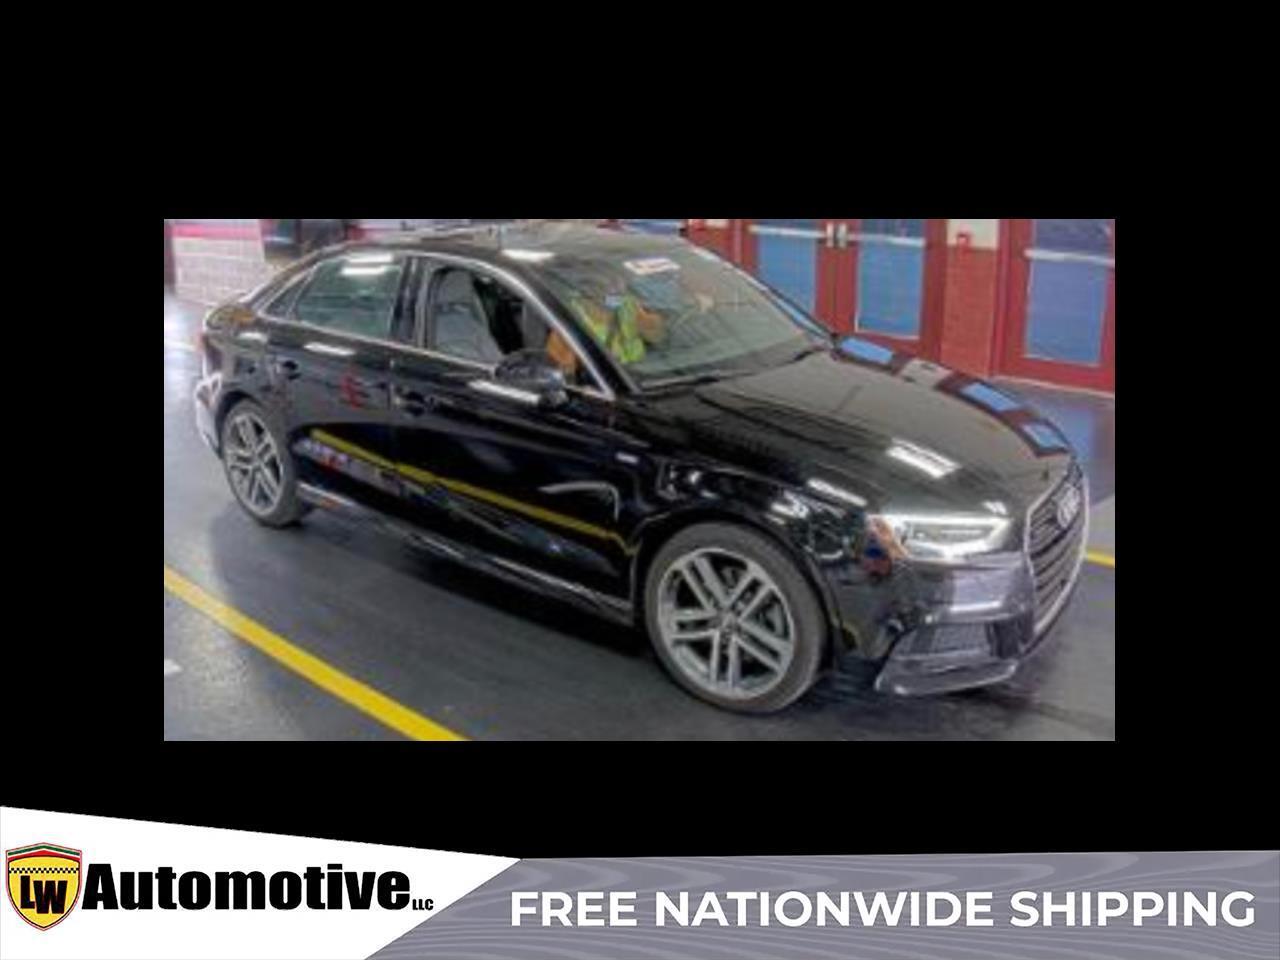 2018 Audi A3 Sedan 2.0 TFSI Tech Premium Plus quattro AWD